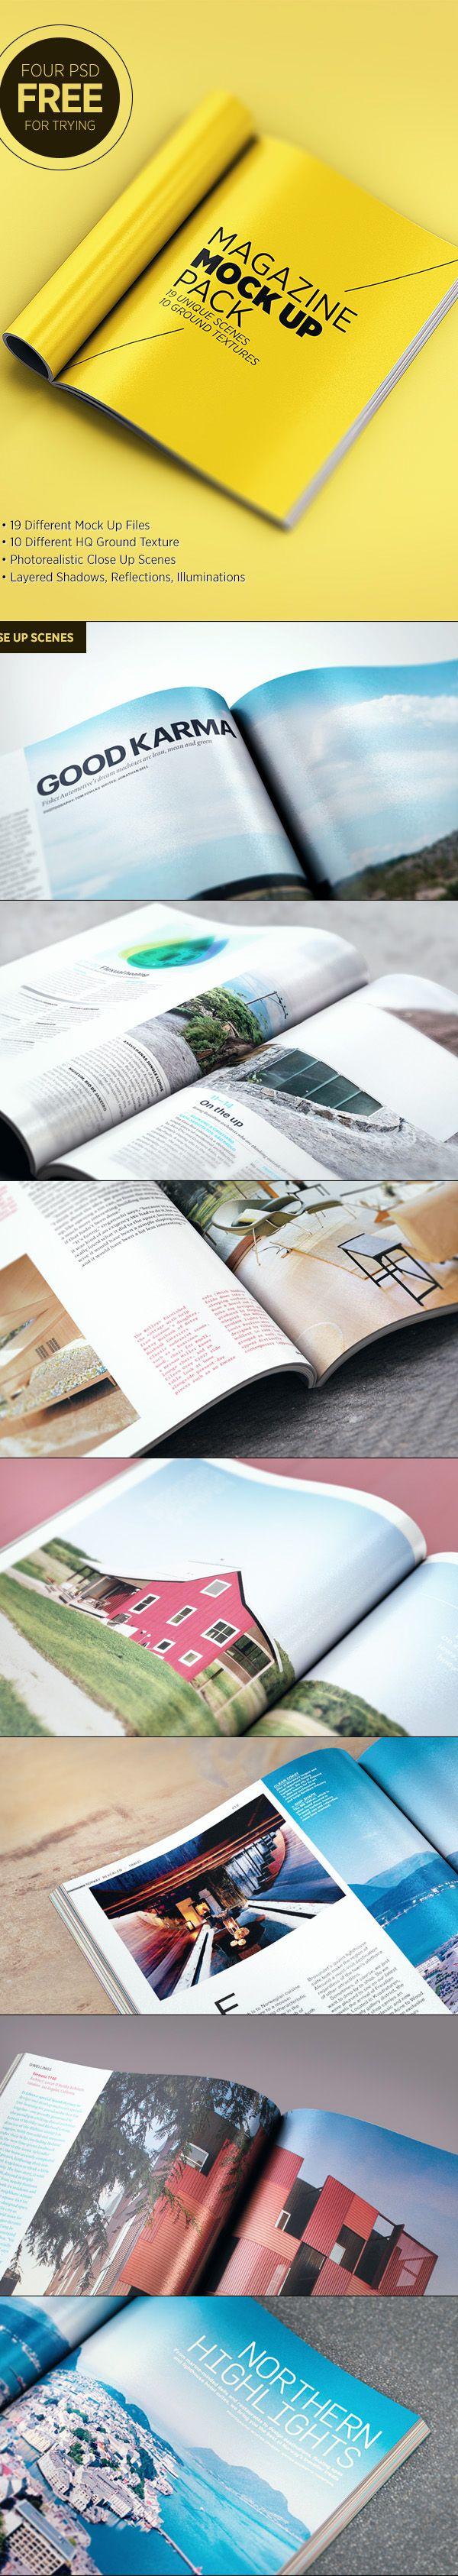 Free magazine mockups.